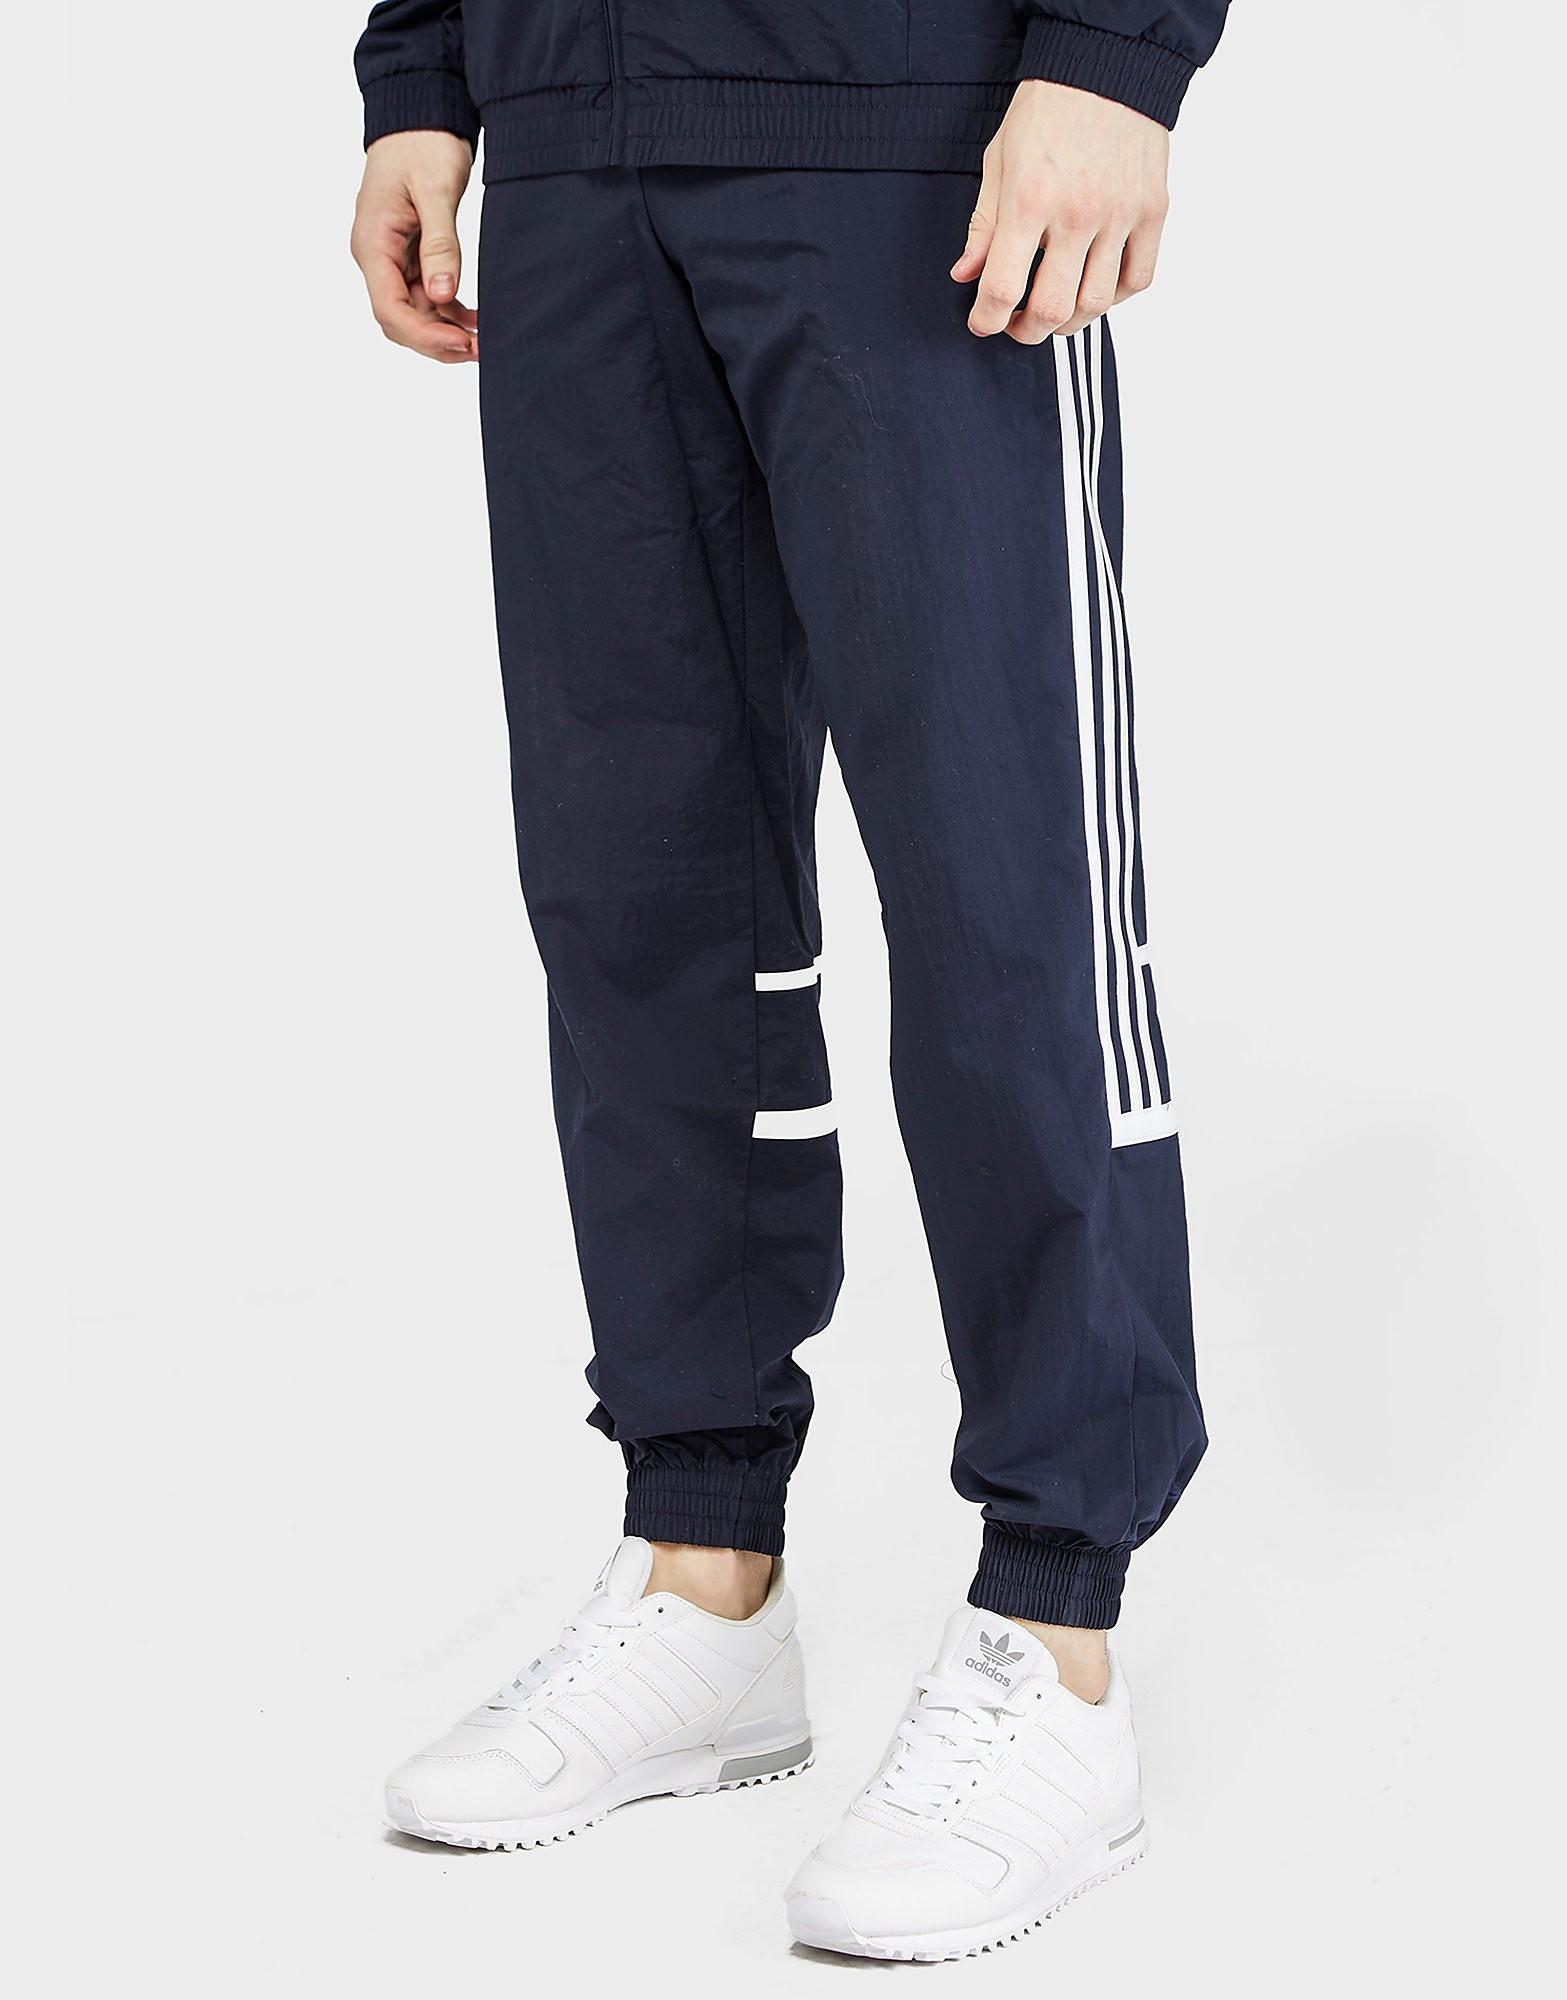 adidas Originals Woven Track Pant